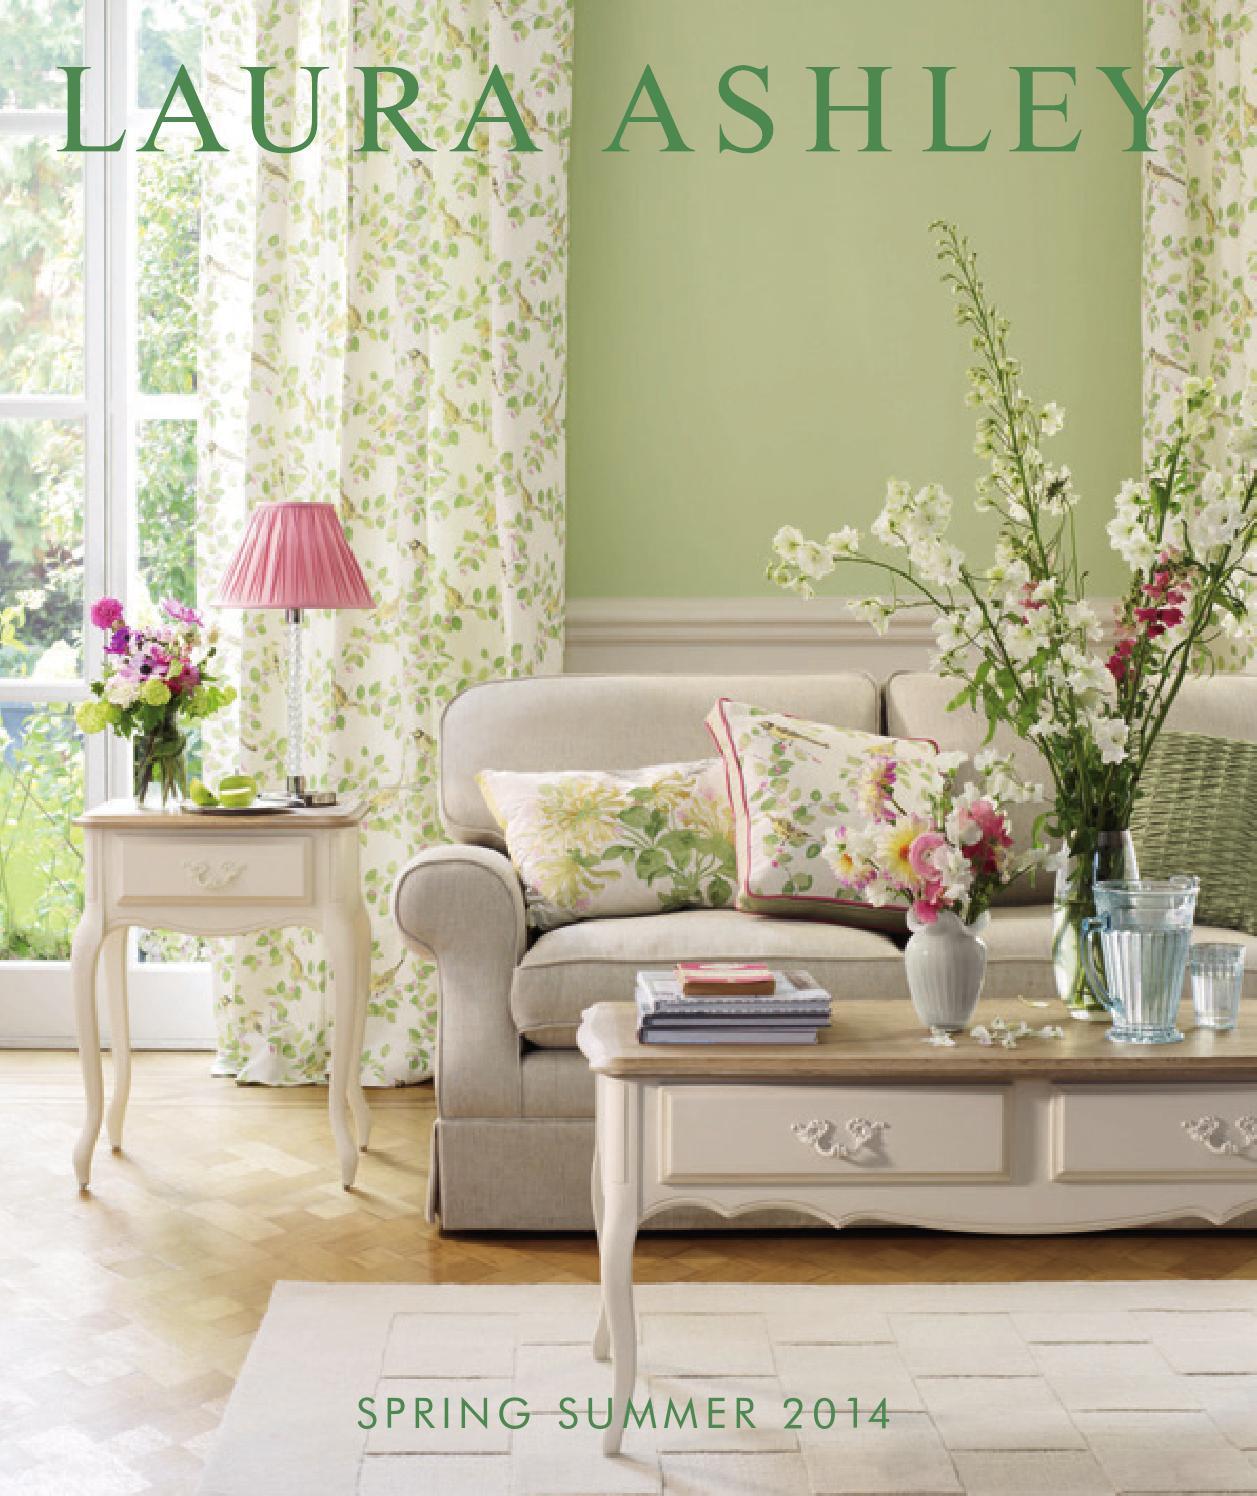 laura ashley katalog spring summer 2014 by laura ashley. Black Bedroom Furniture Sets. Home Design Ideas